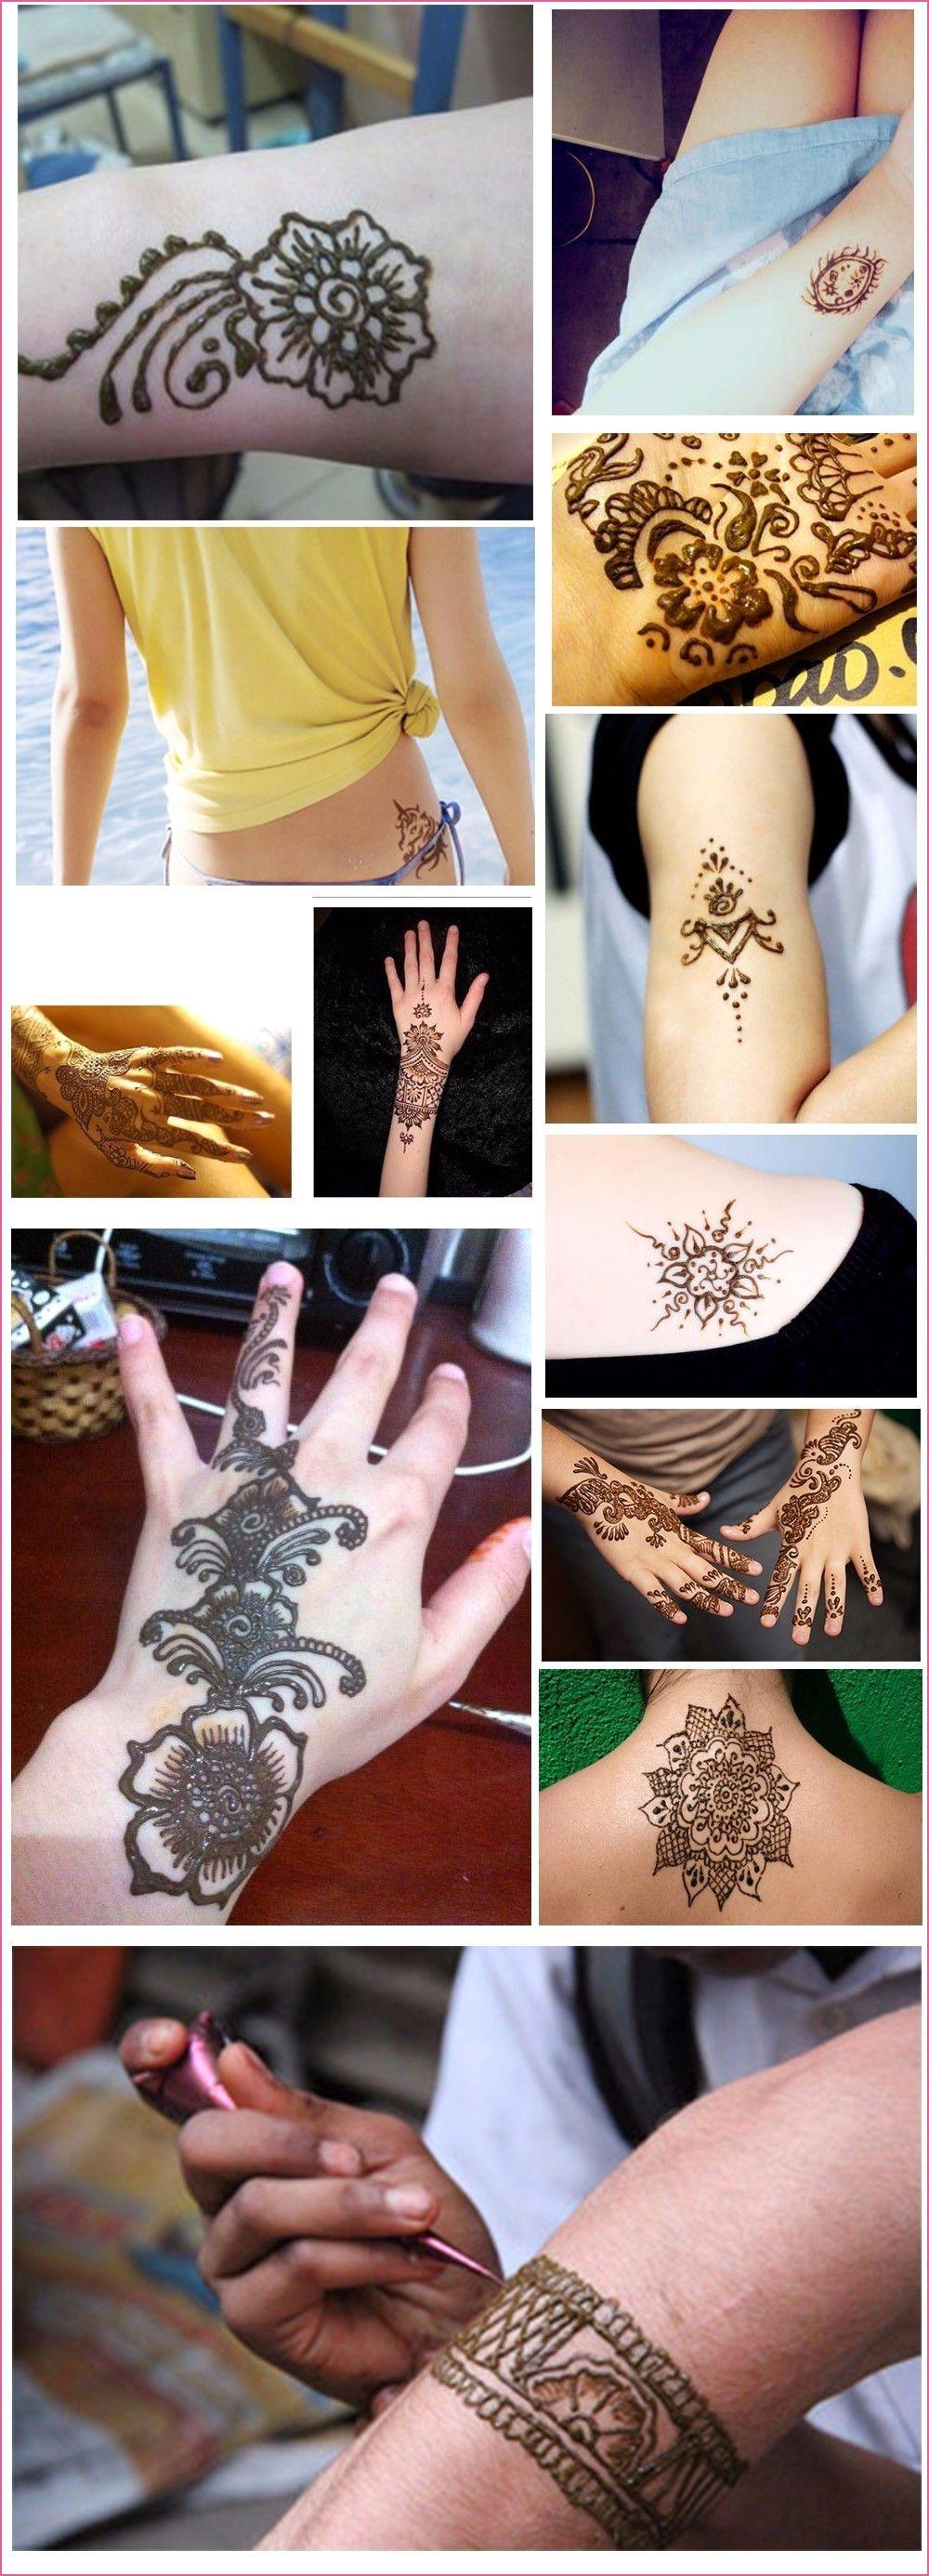 Henna Tattoo Farbe Kaufen Hannover: Henna Paste Kaufen Henna Paste Kaufen . Henna Paste Kaufen